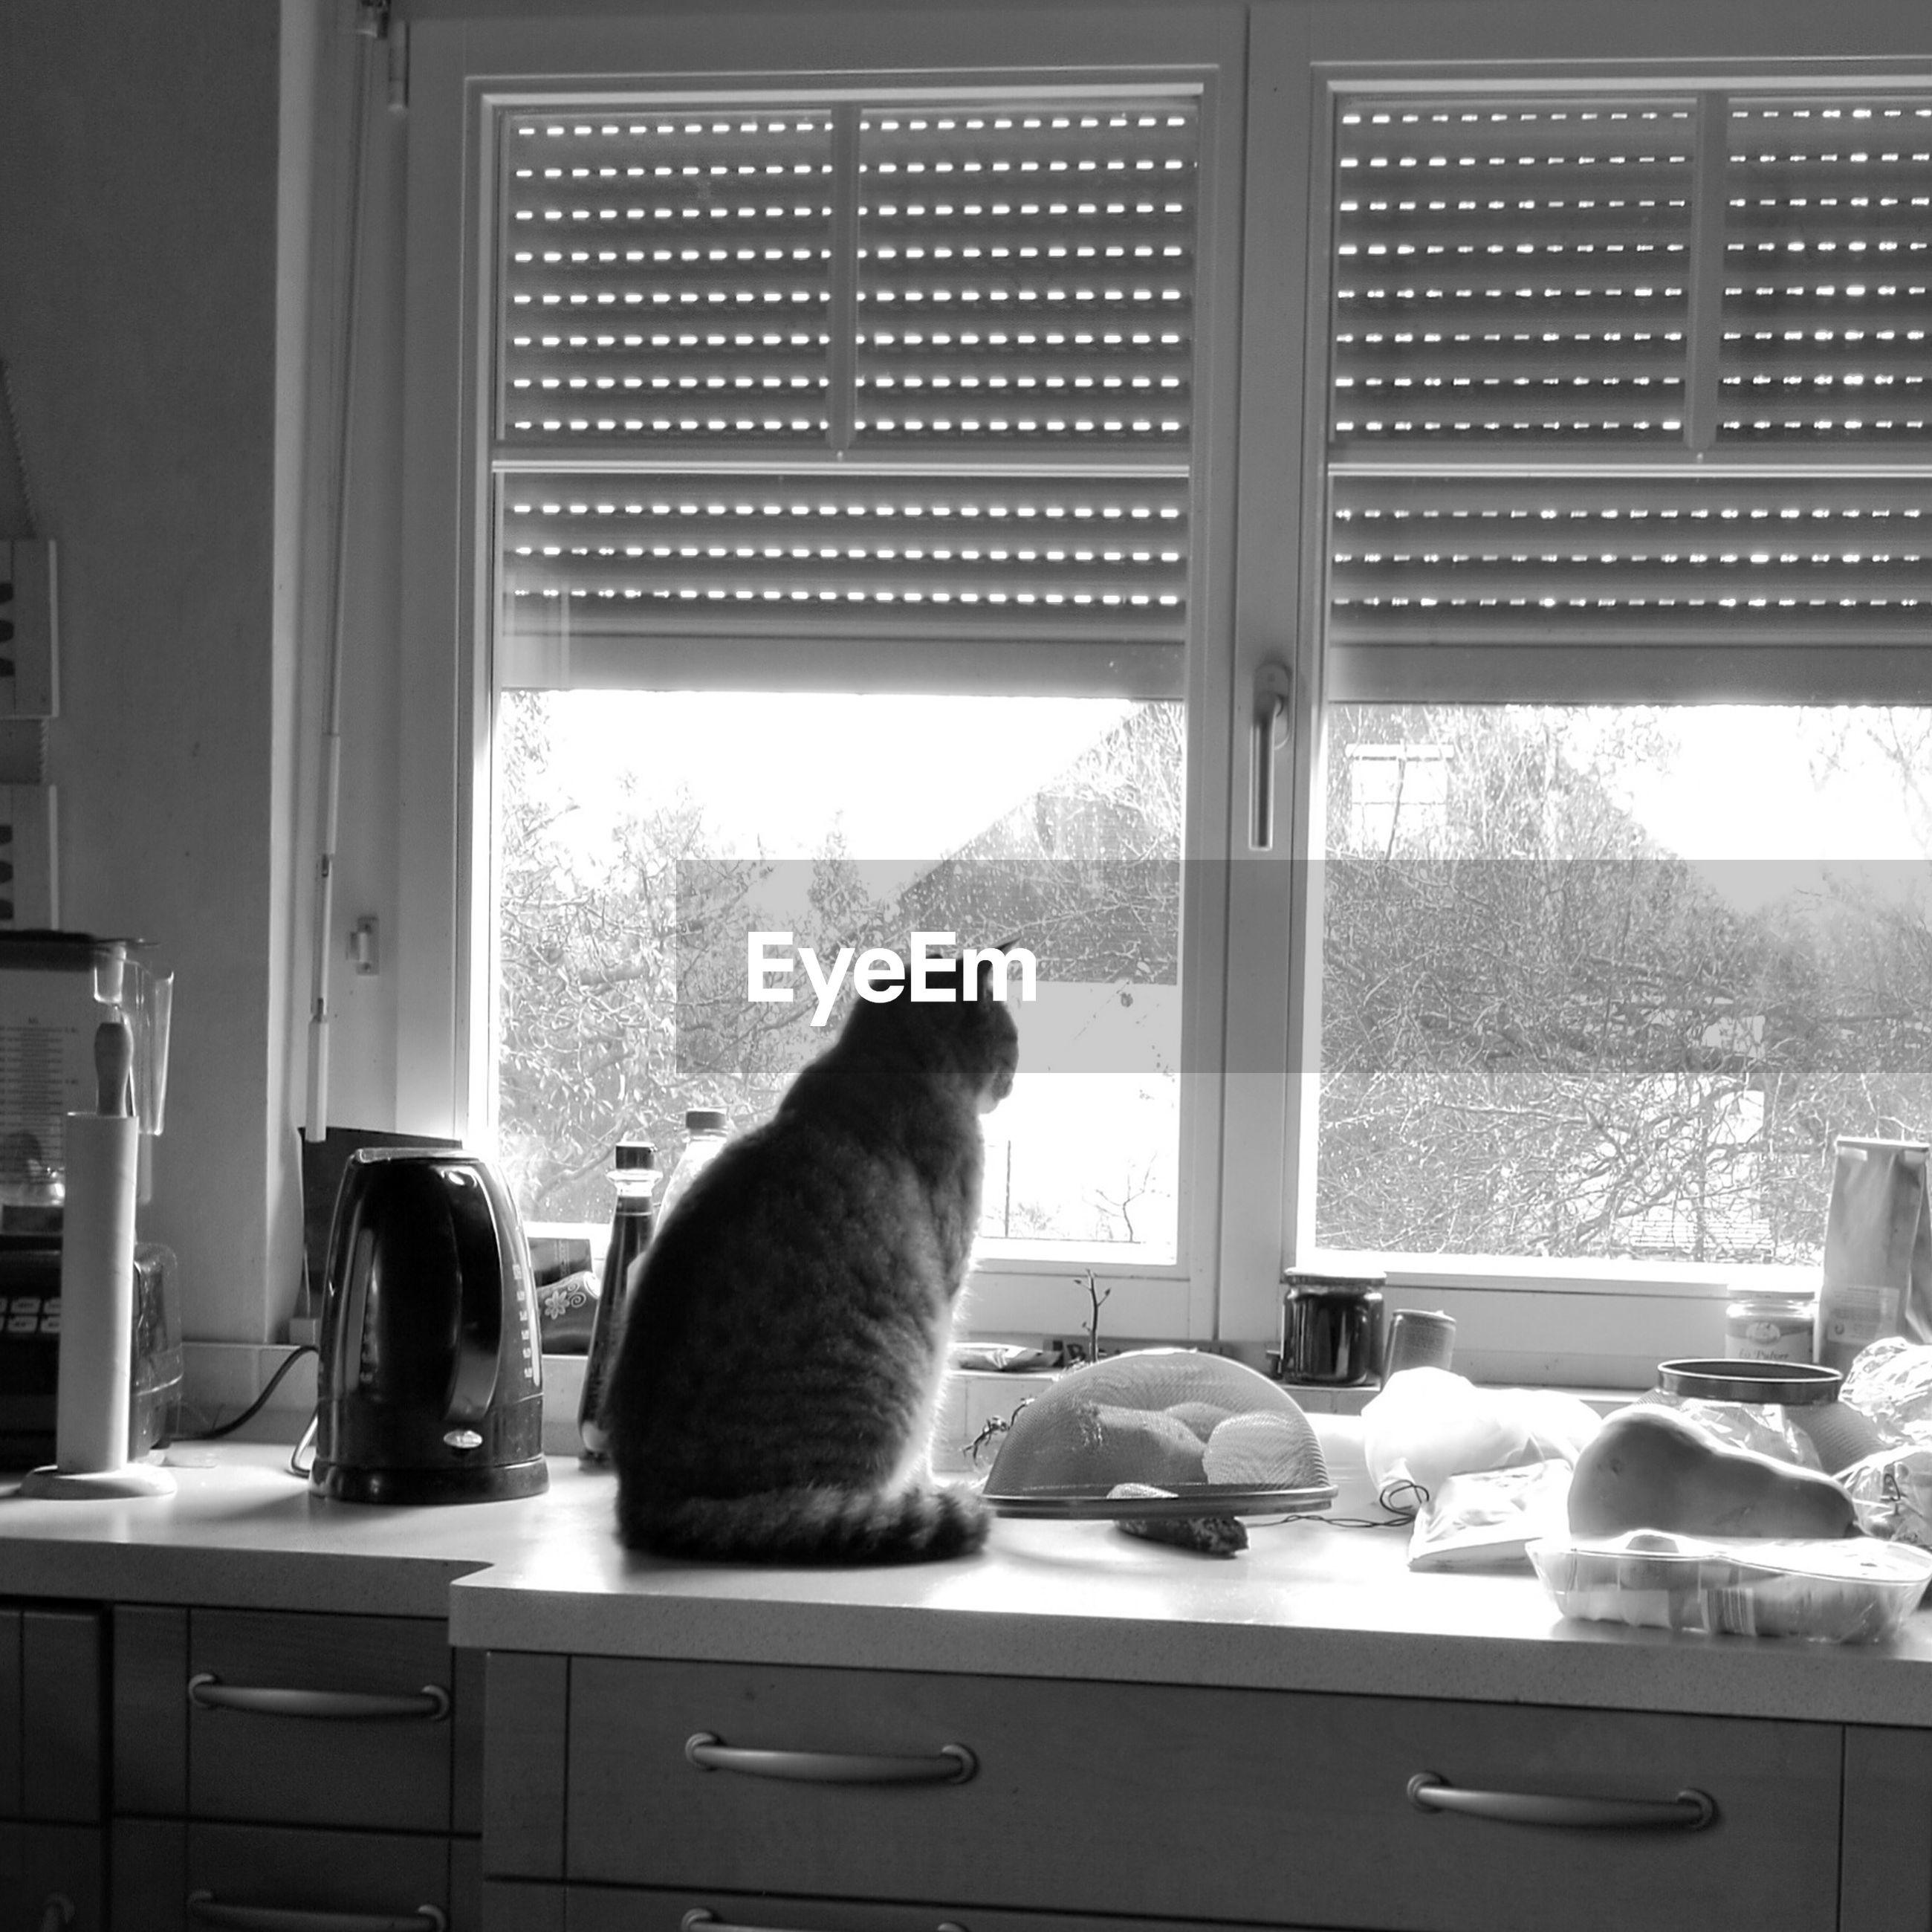 CAT SITTING IN GLASS WINDOW